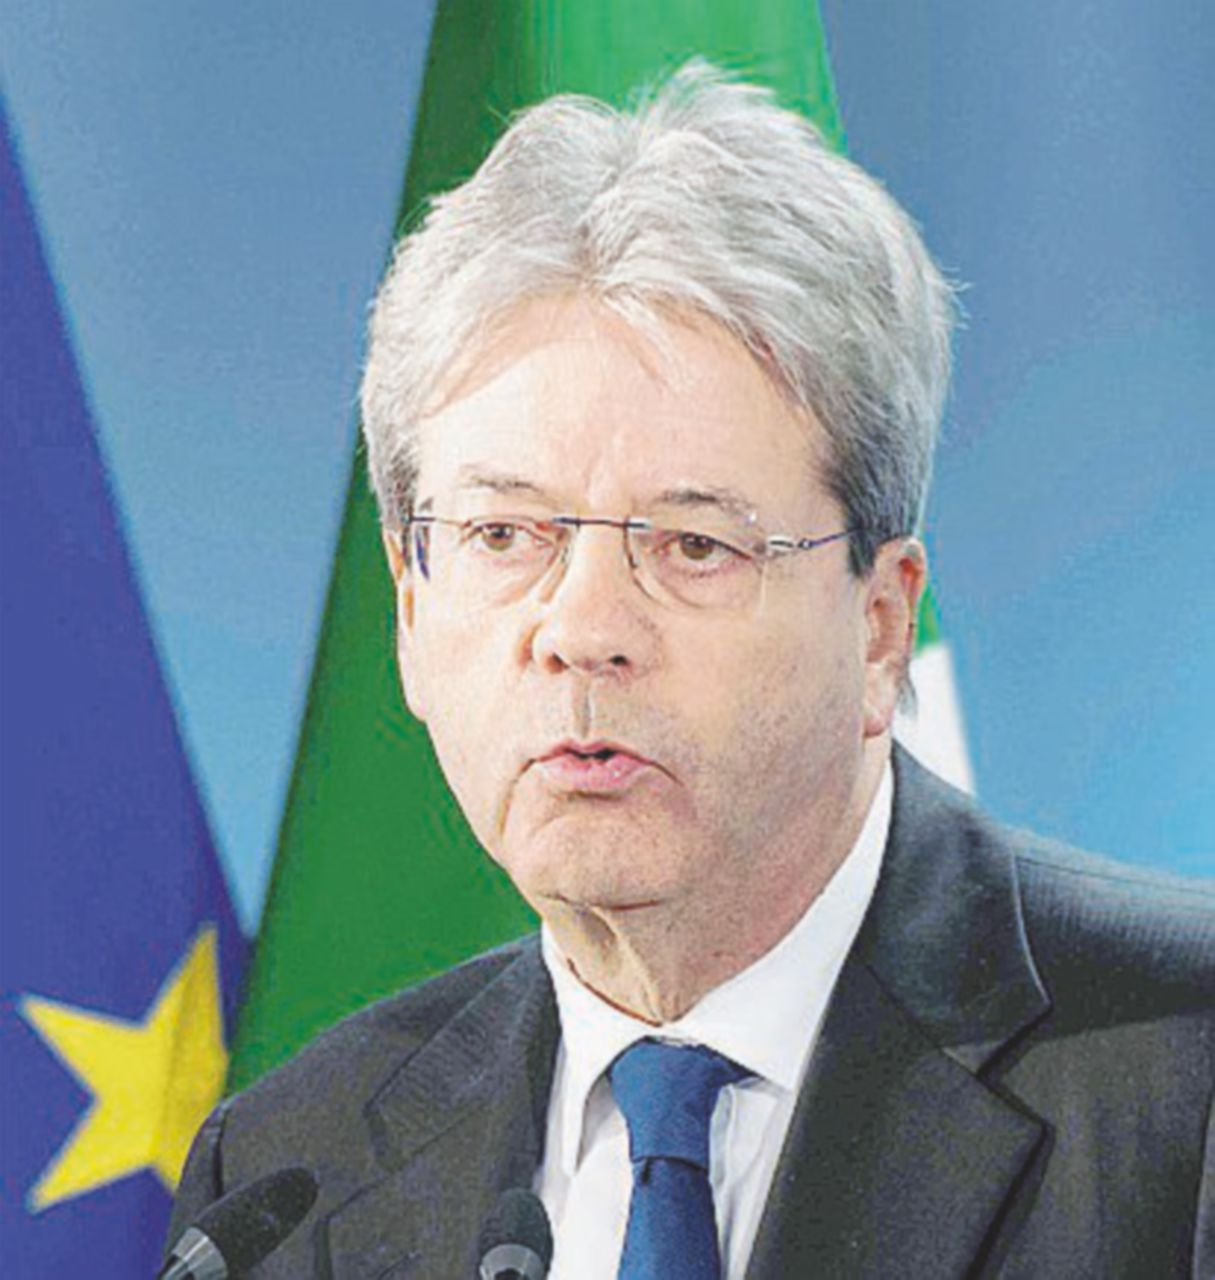 Sabato Renzi prova a oscurare Gentiloni